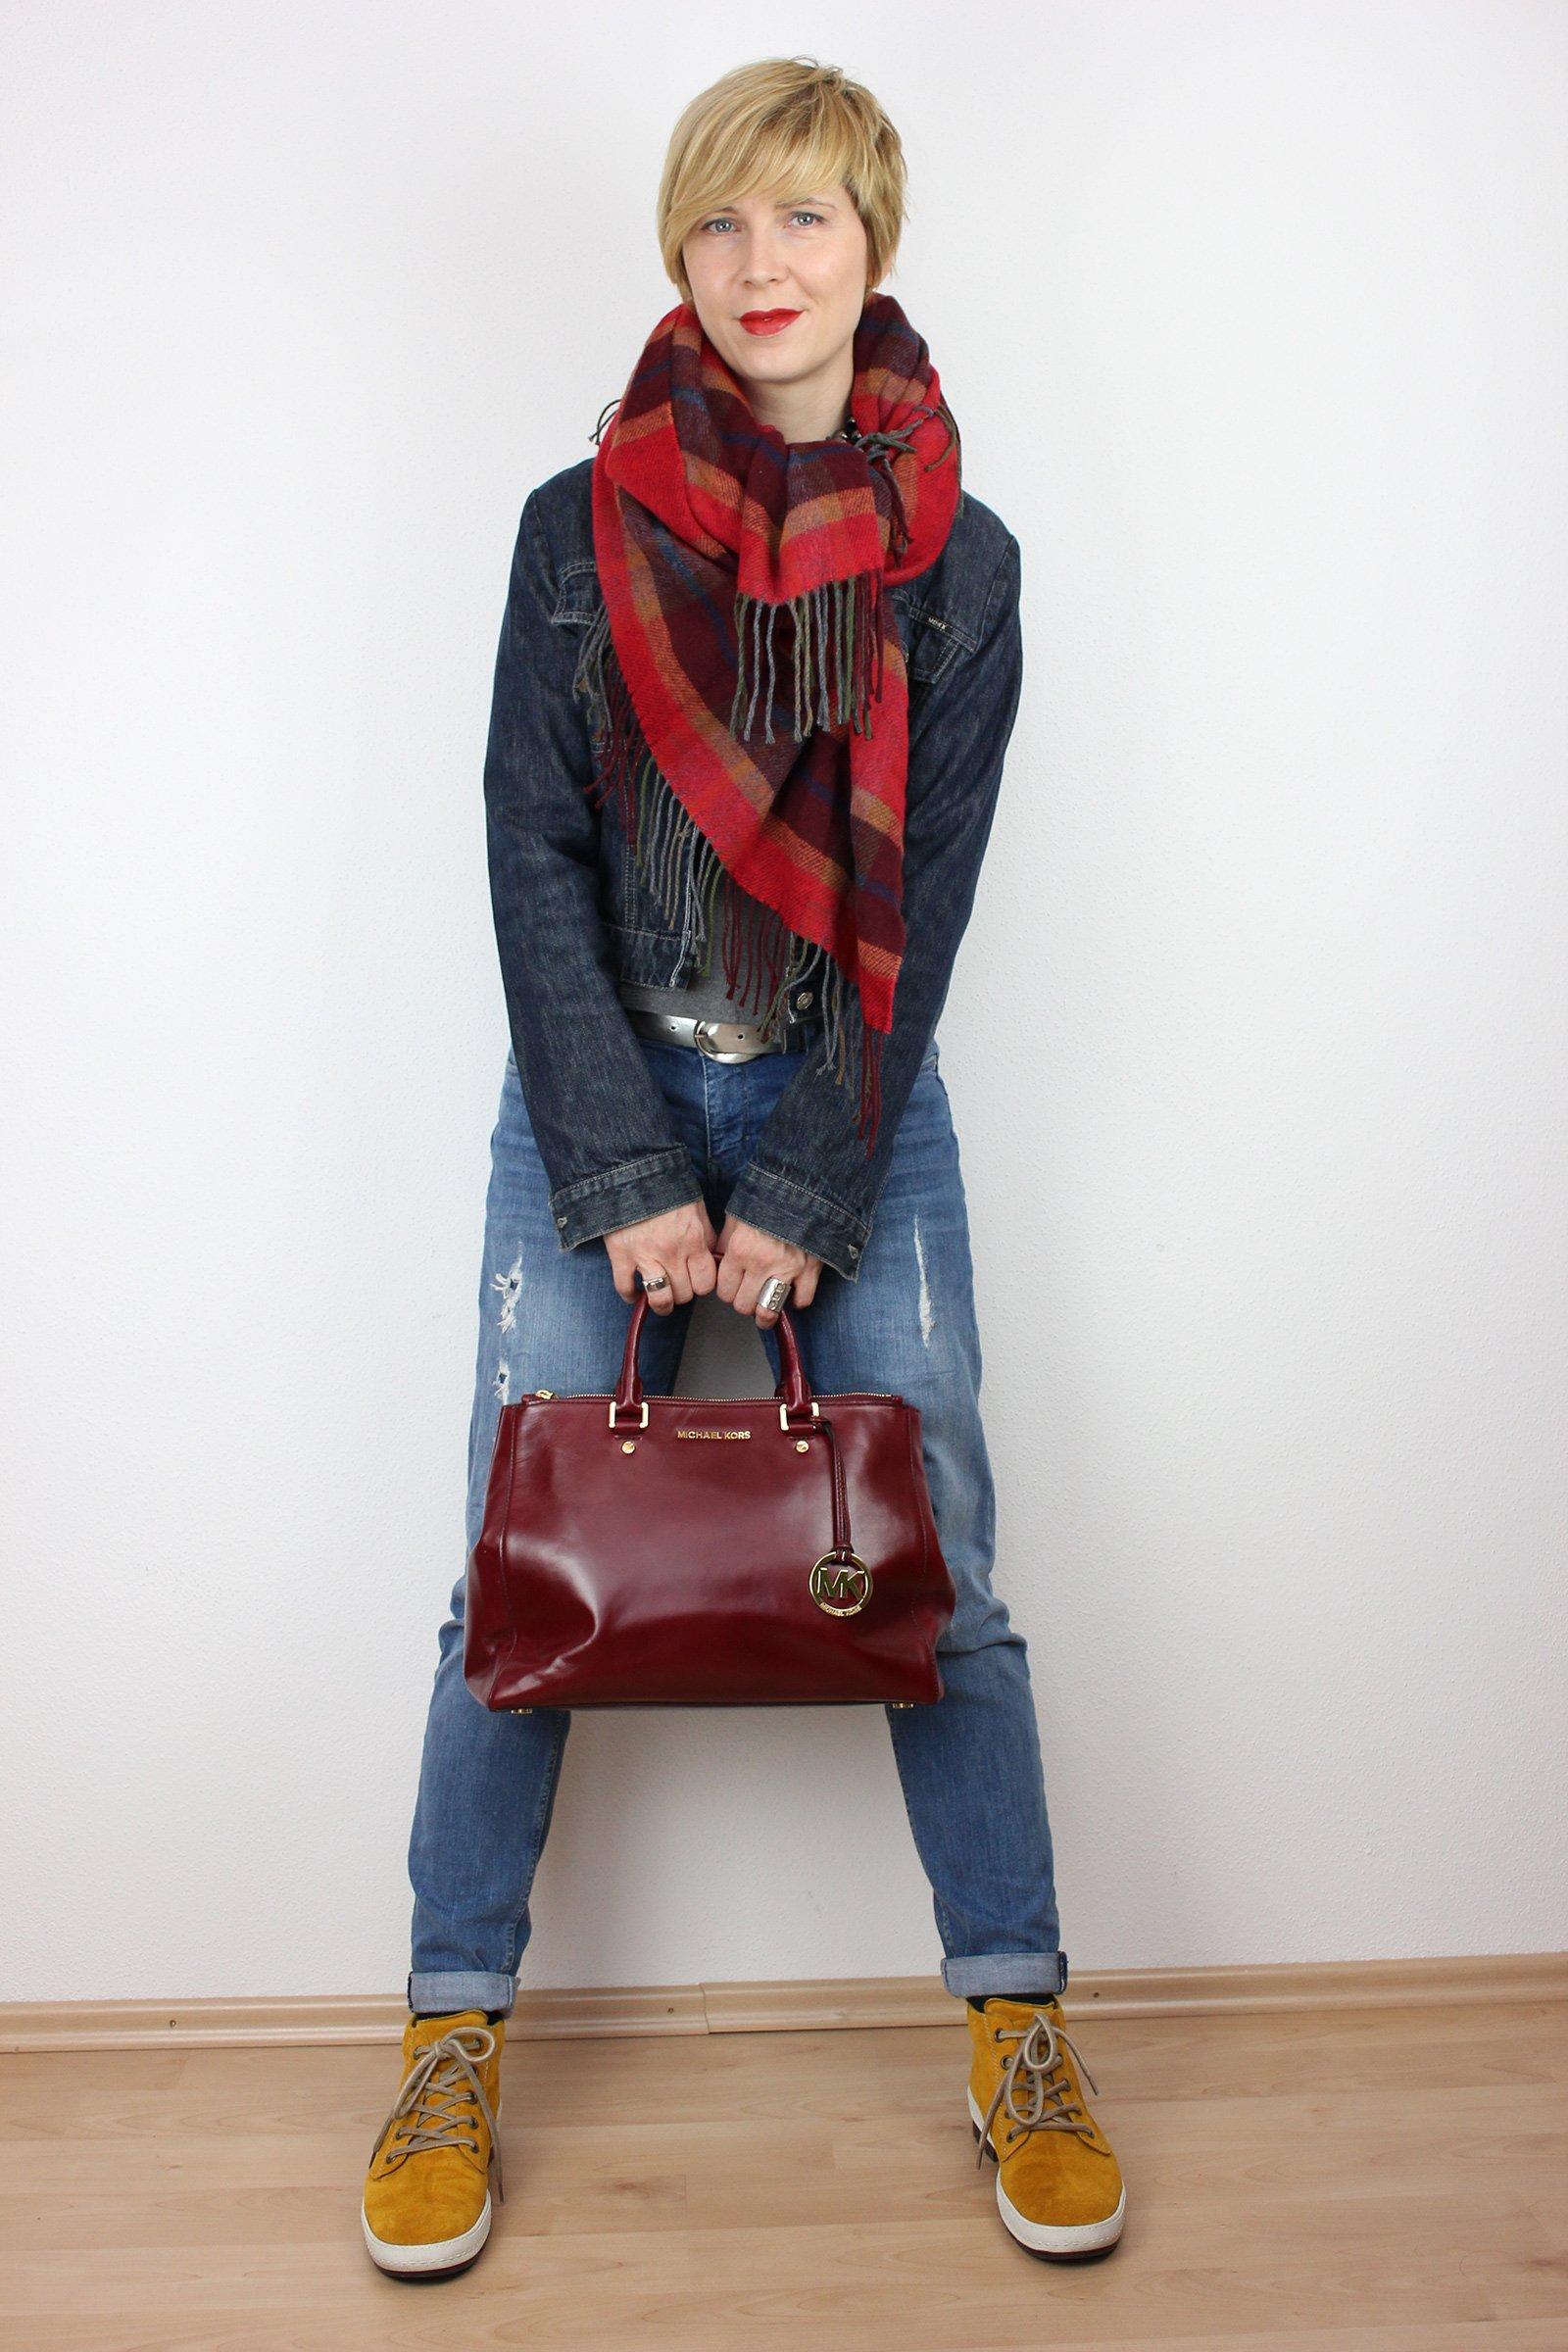 IMG_3146a_OversizedScarf_BoyfriendJeans_Cape_rot_senfgelb_MichaelKors